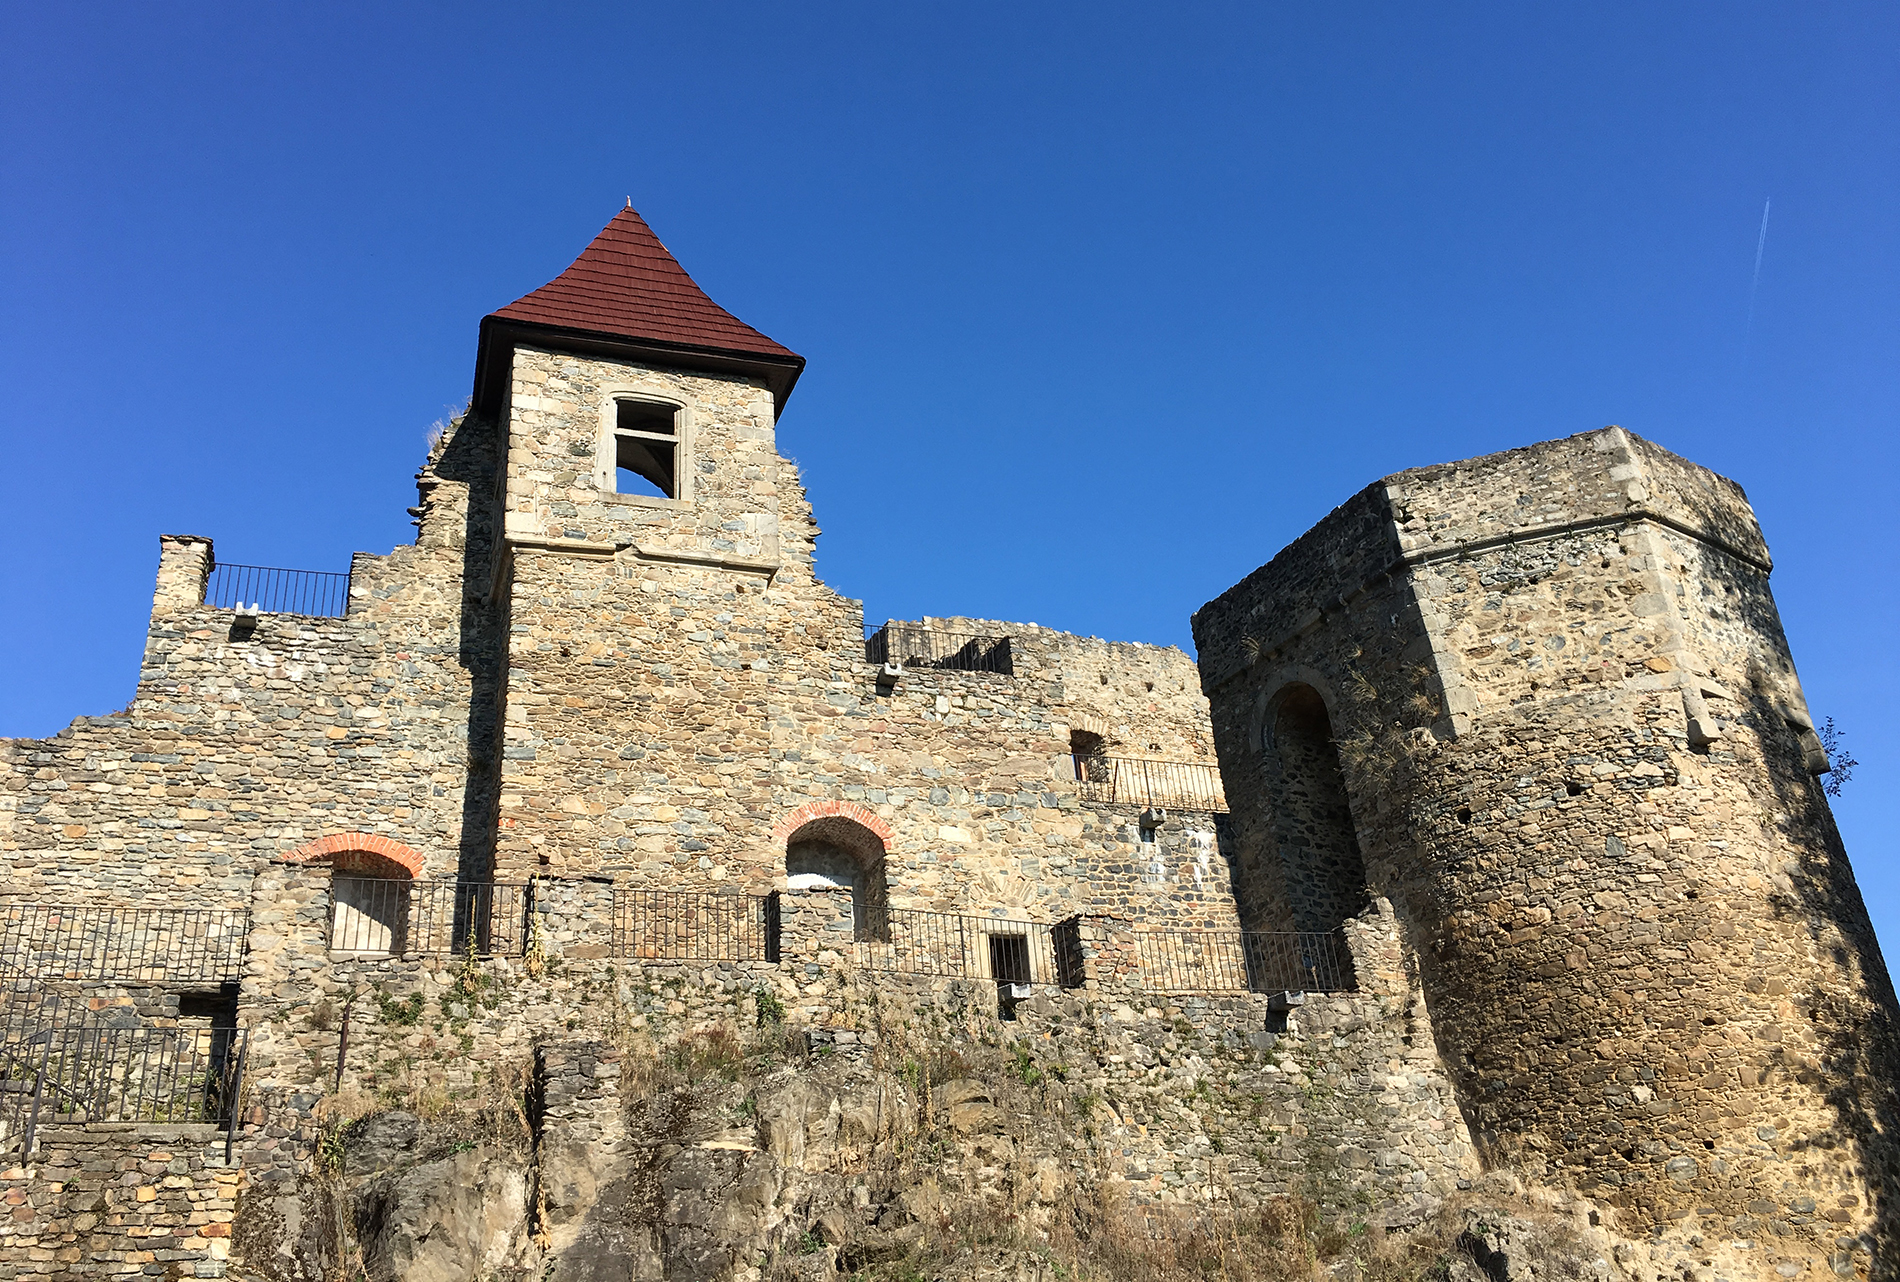 Klatovy / Klenova castle